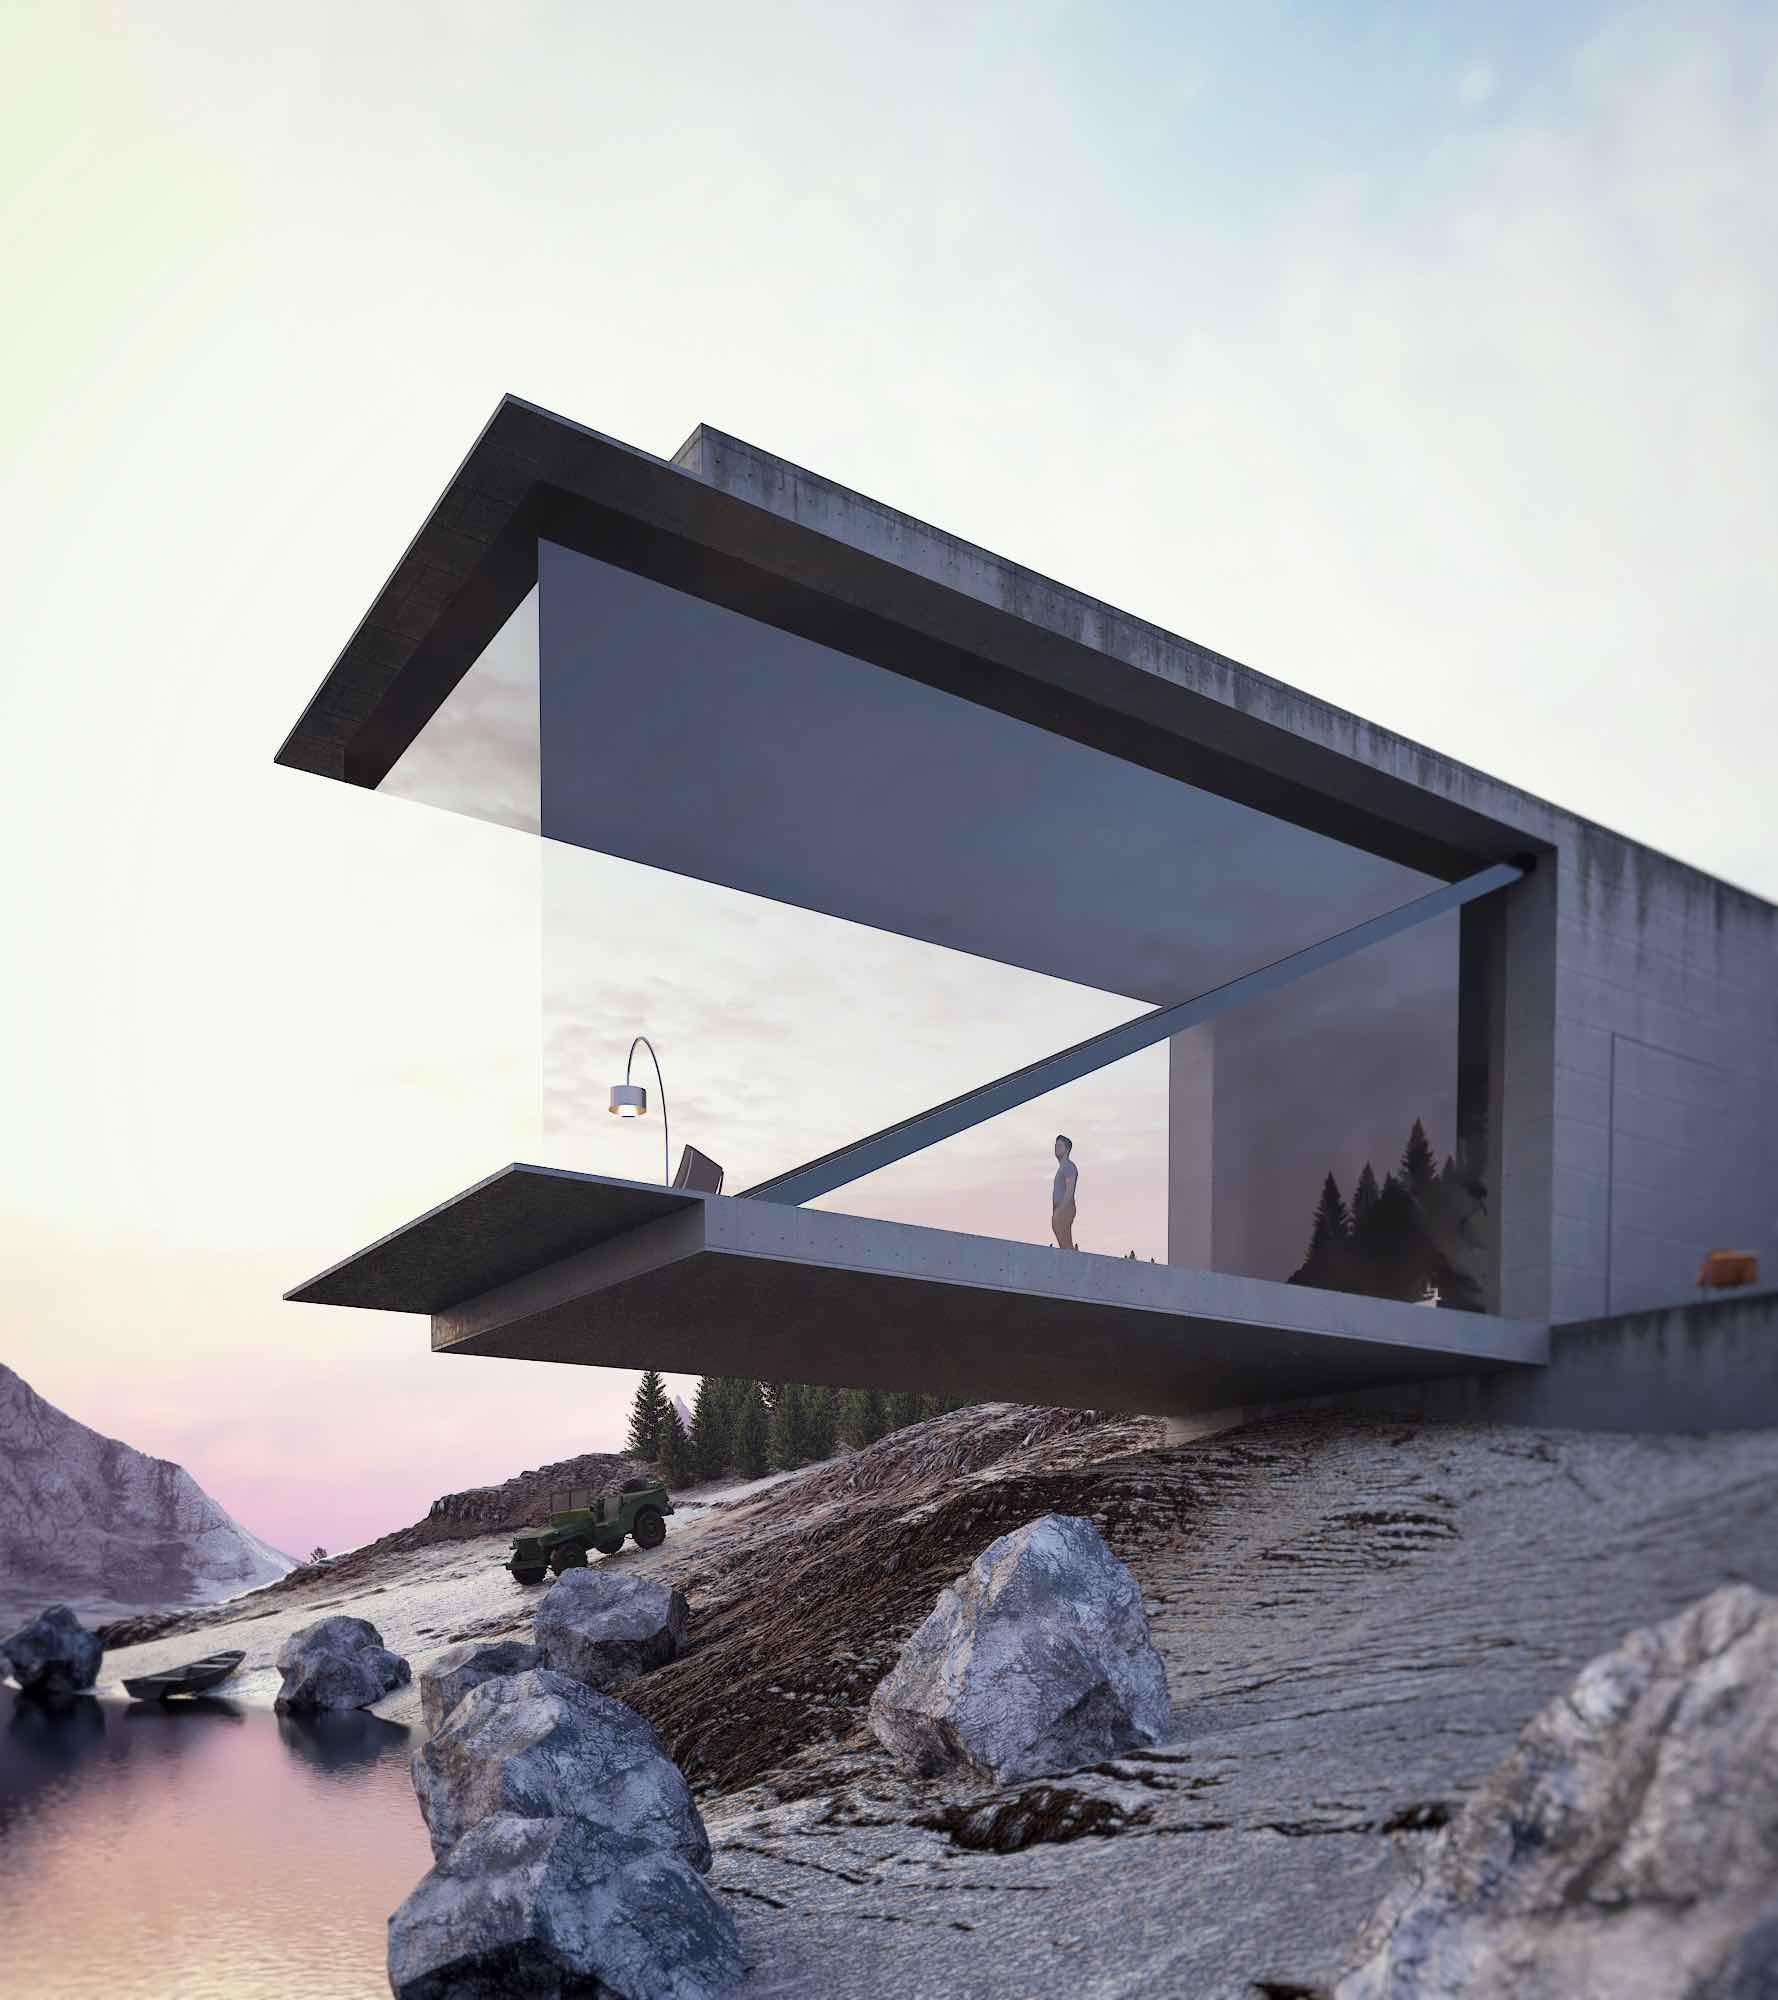 Minimalism in a Swiss Lake by Reza Mohatashami